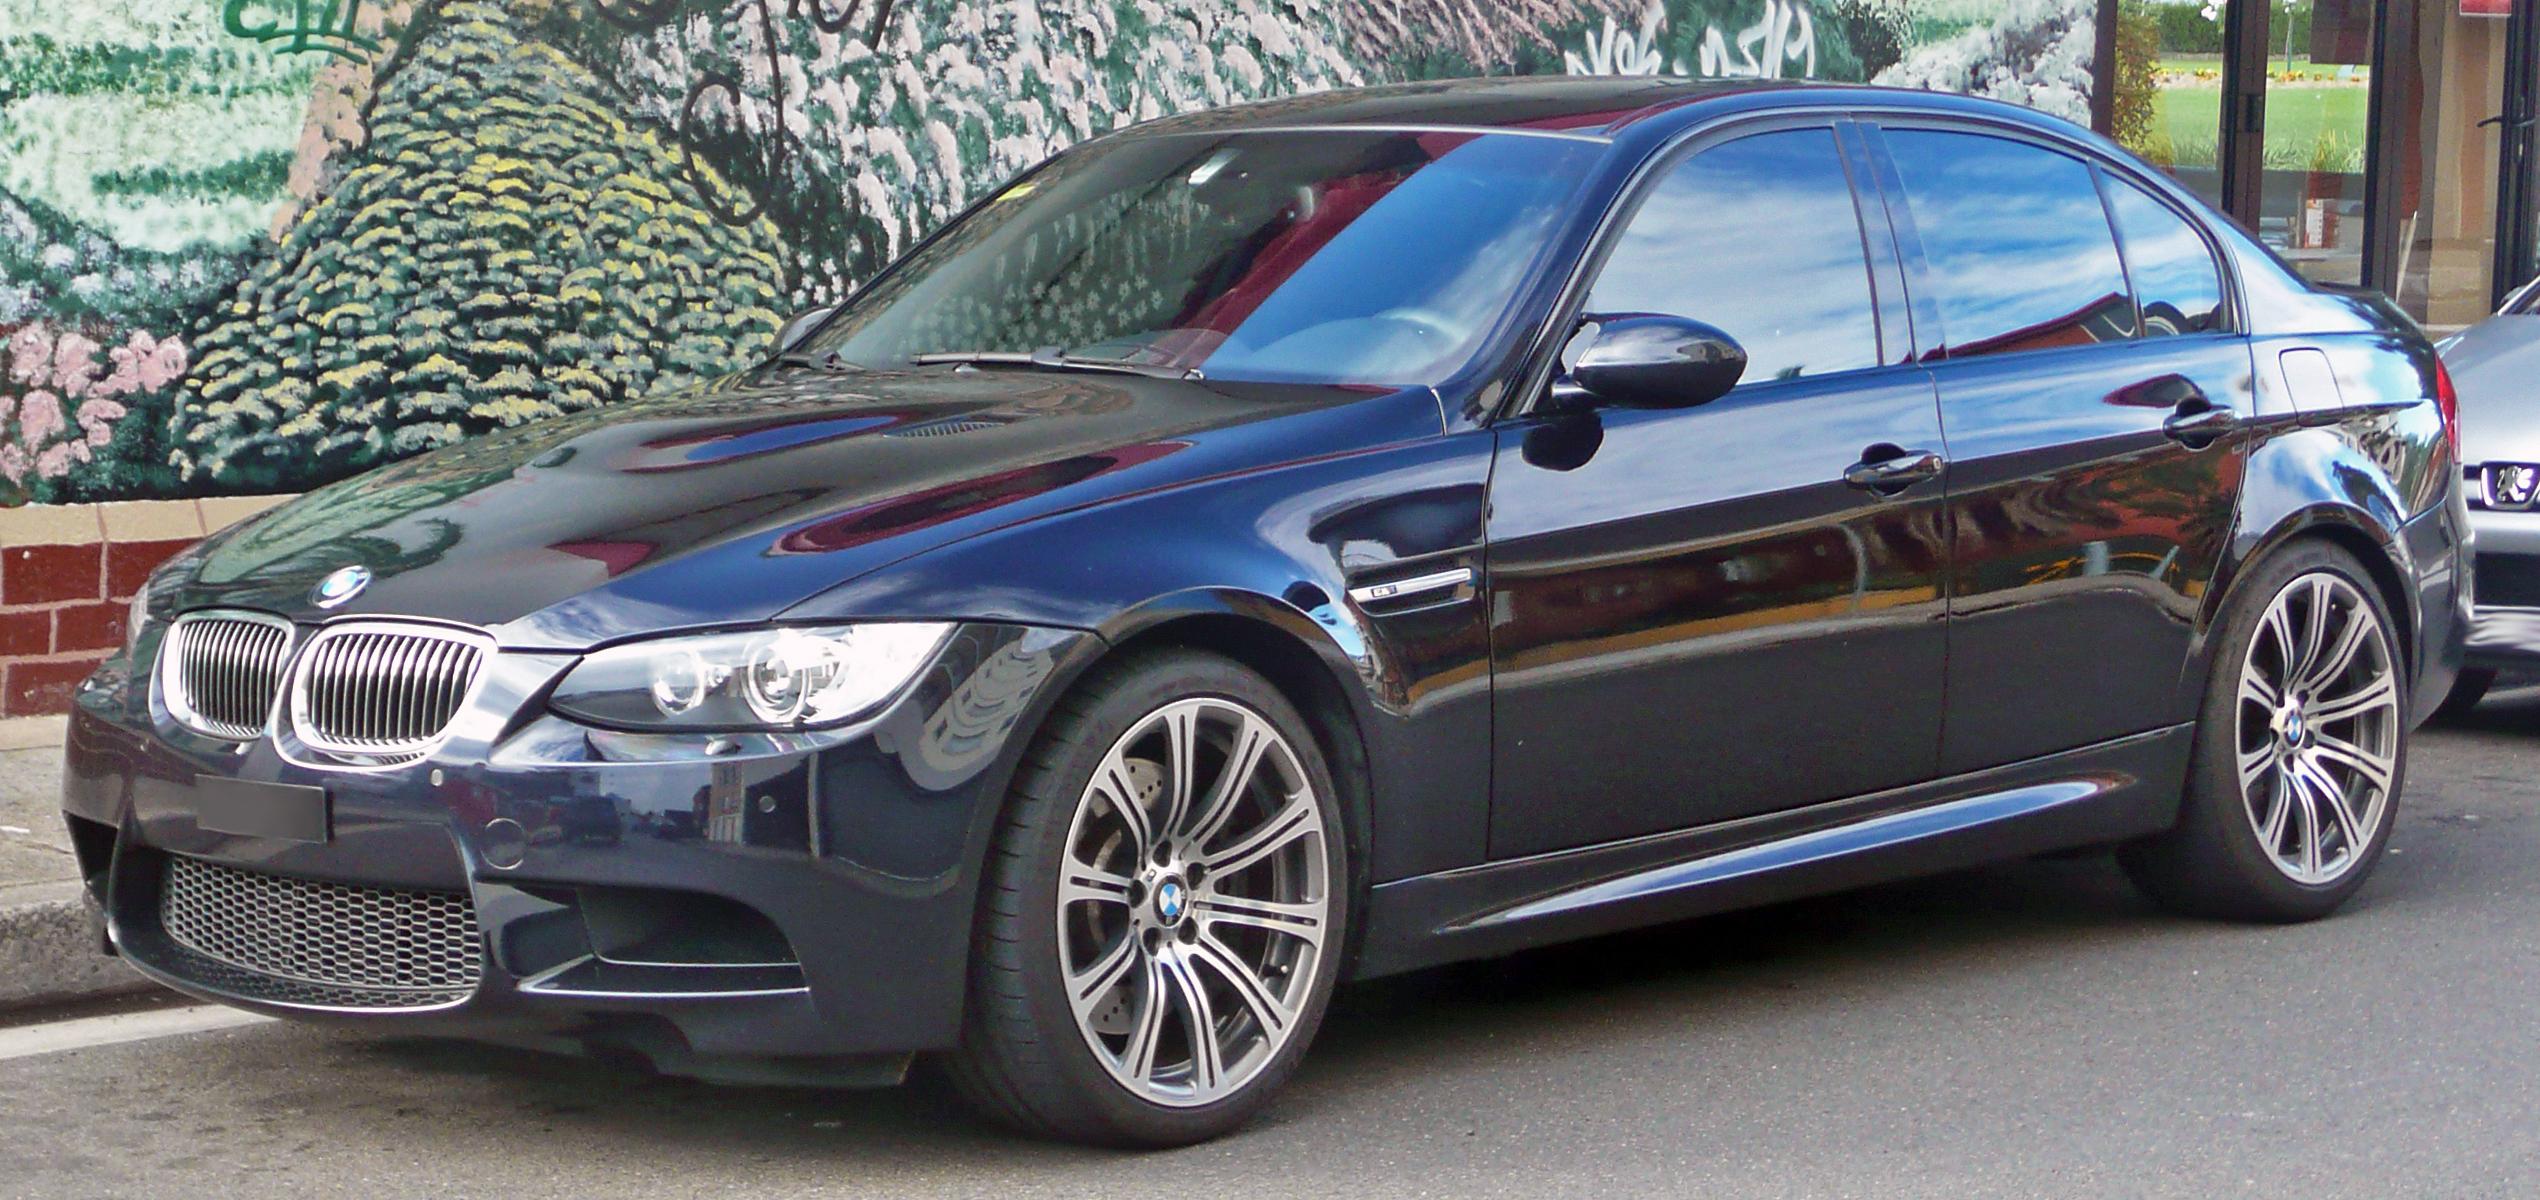 Bmw E90 Wiki >> File:2008-2010 BMW M3 (E90) sedan 01.jpg - Wikimedia Commons